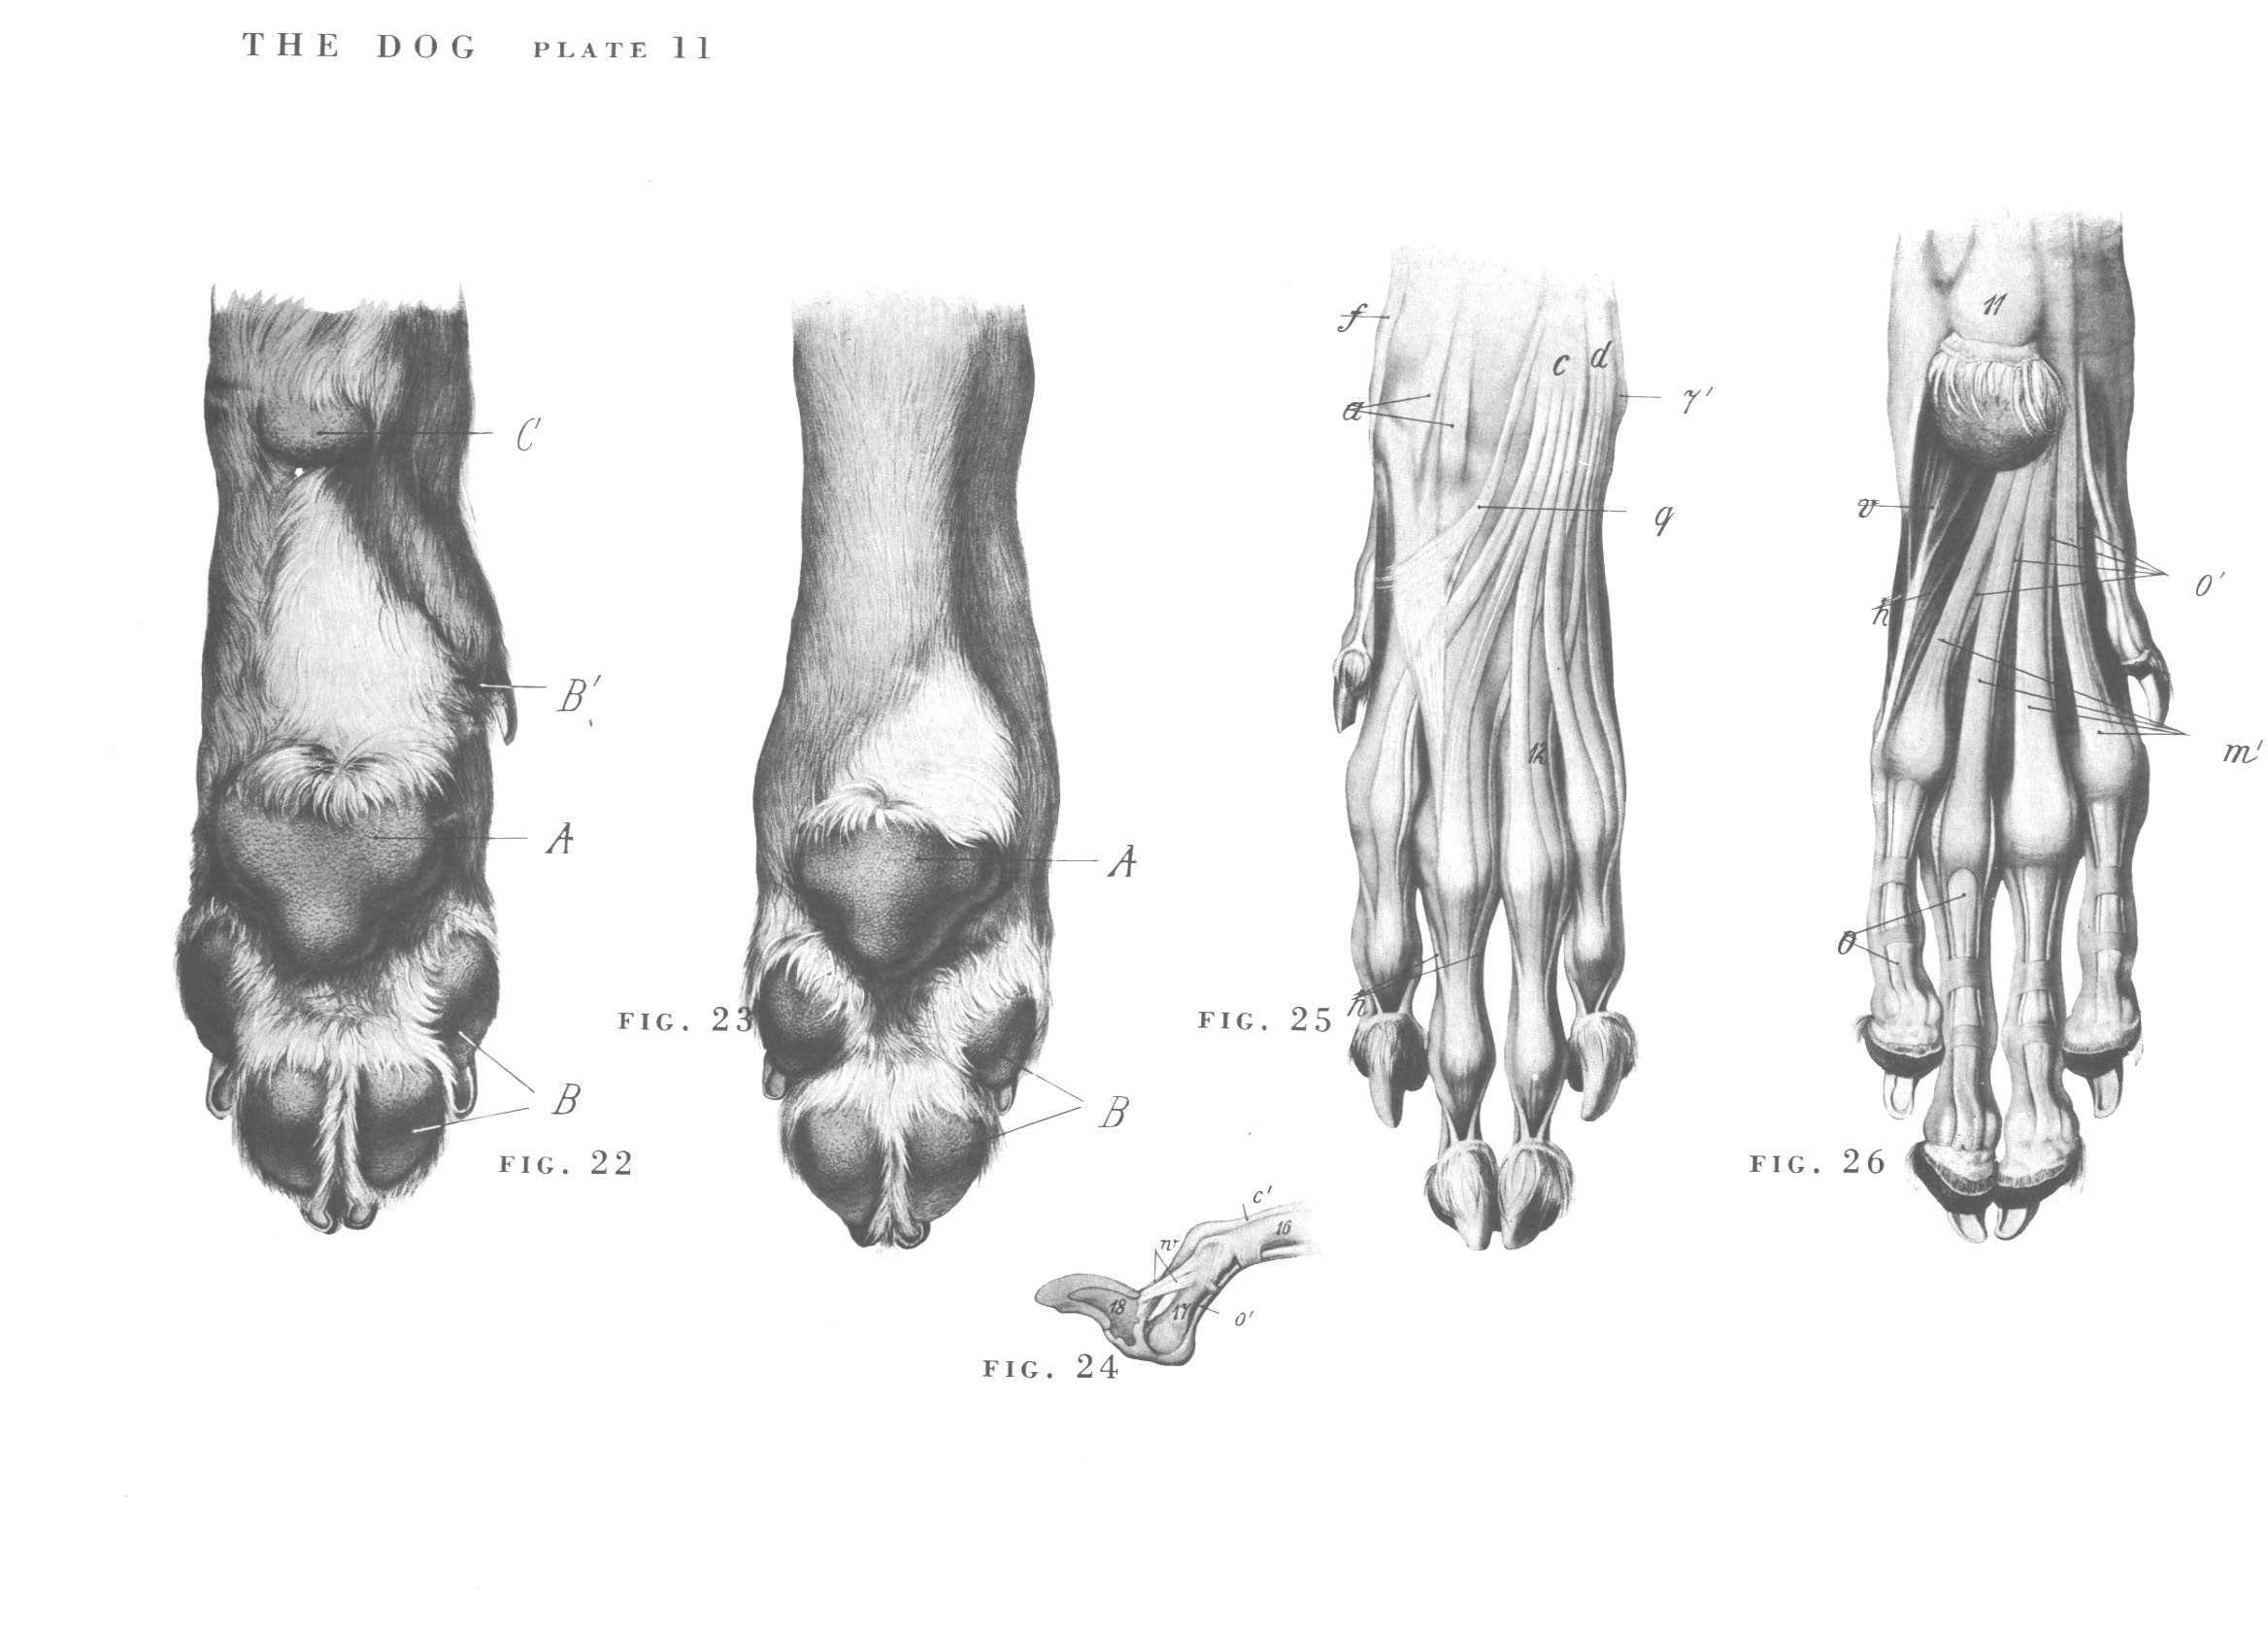 Pin by Paulina Duda on anatomy | Pinterest | Anatomy